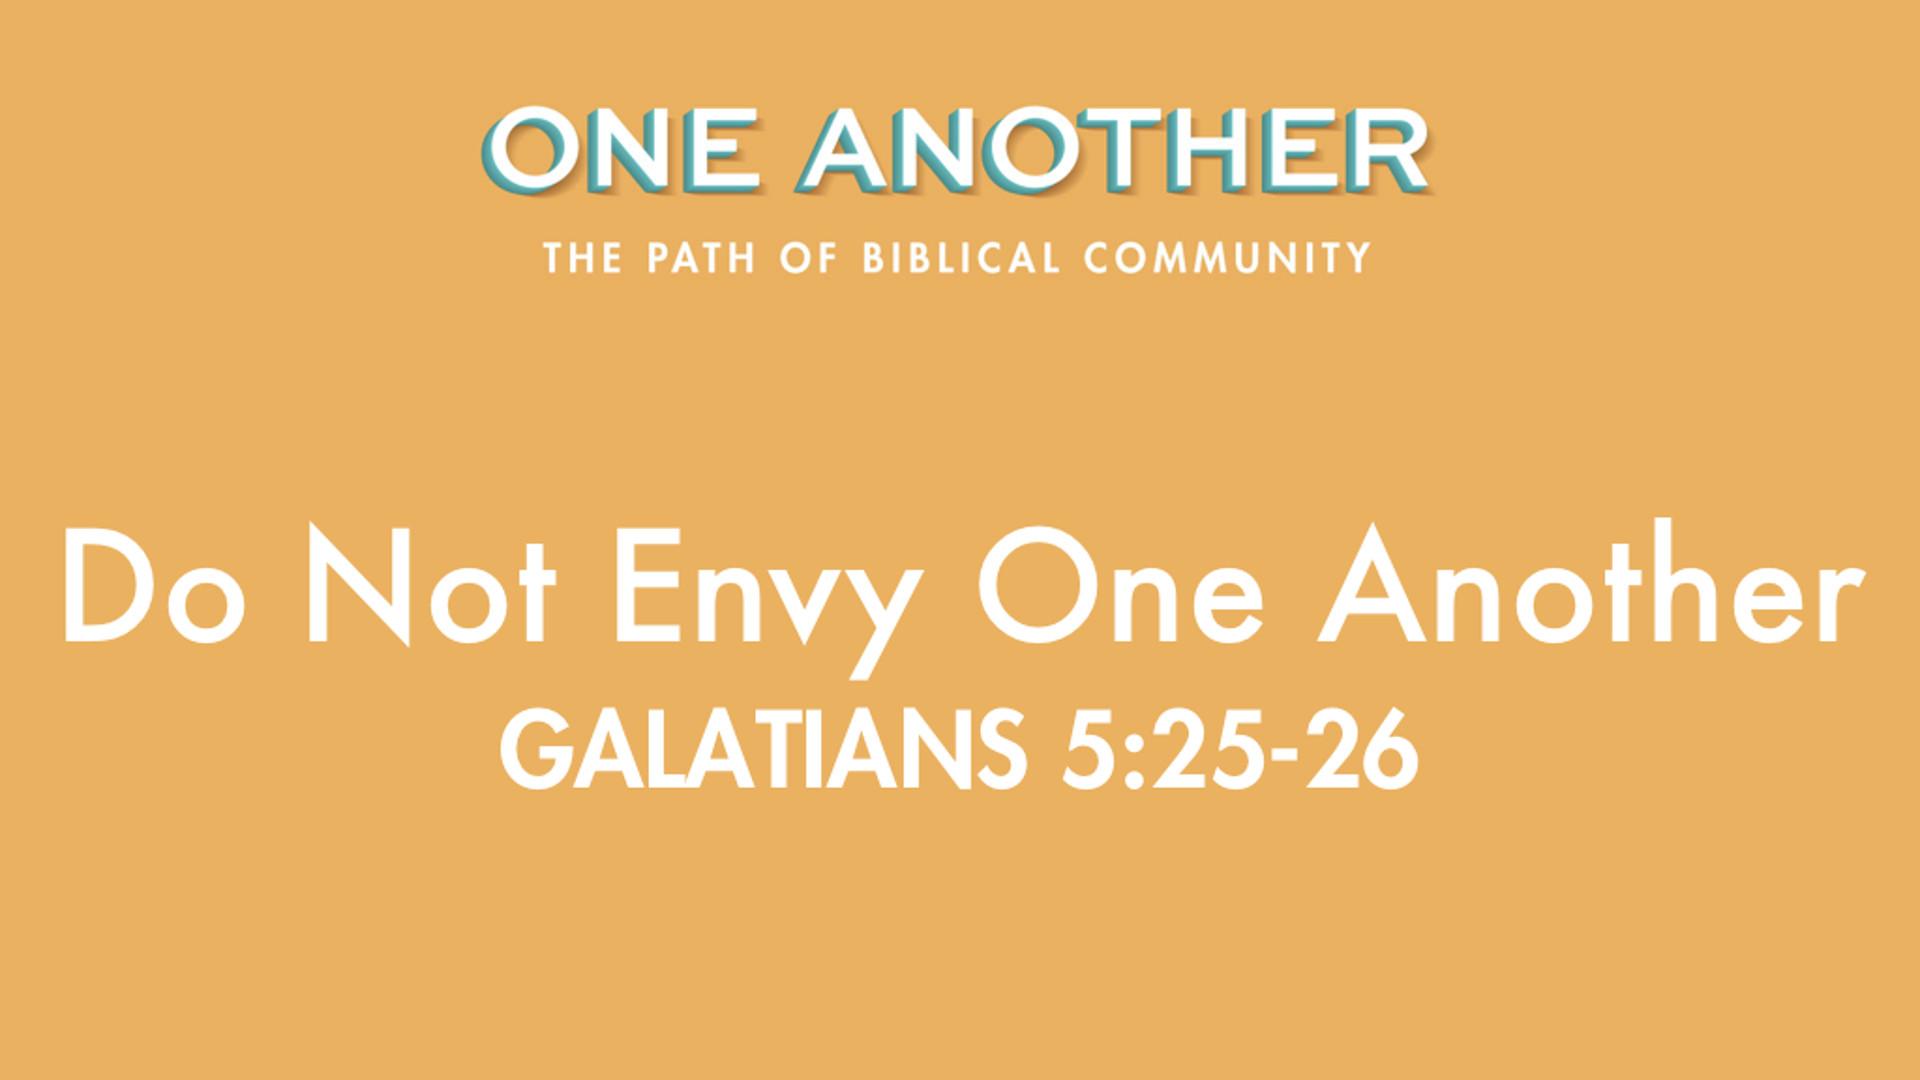 3Do Not Envy One Another - Galatians 5.25-26.jpg